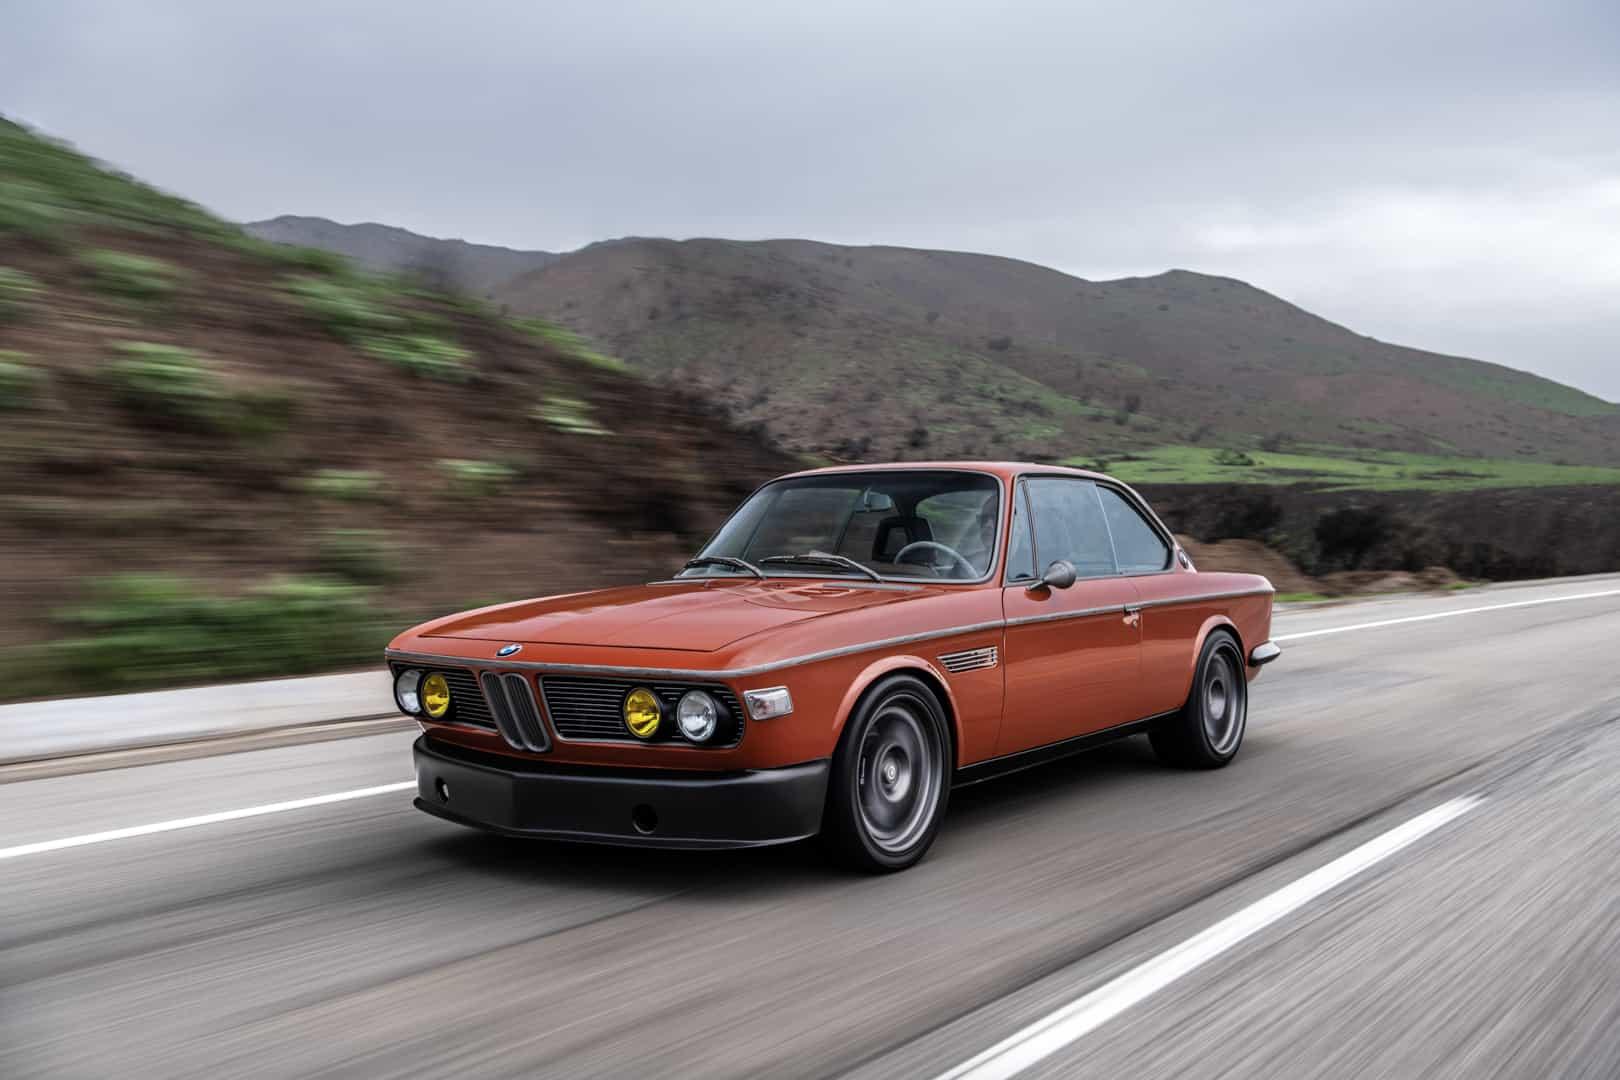 Robert Downey Jr SpeedKore BMW 3.0 CS 34